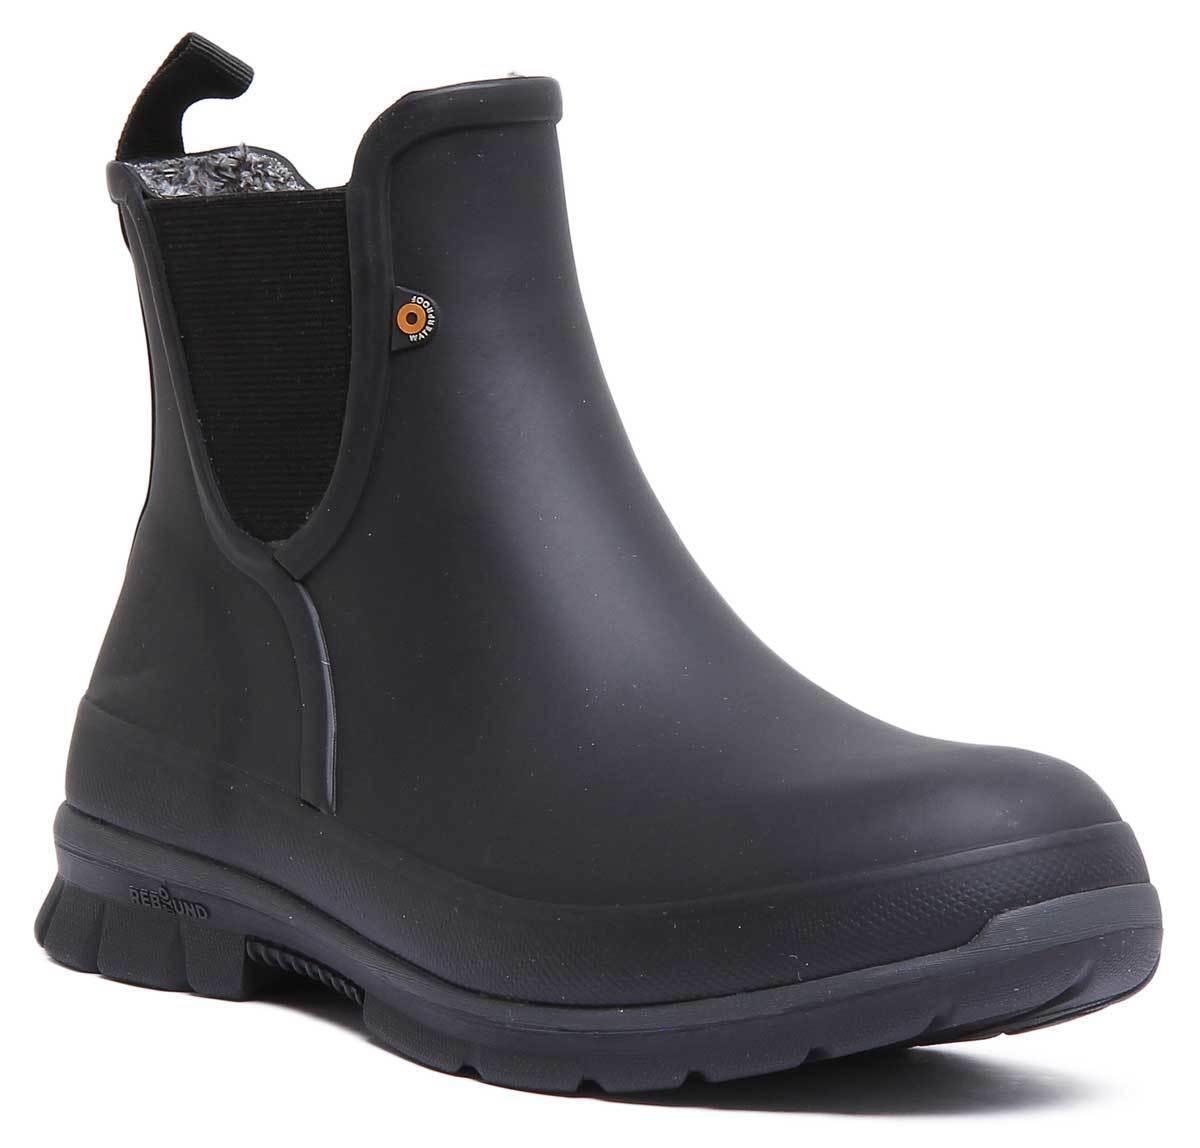 Amanda Plush Slip On Women Rubber Black Chelsea Rain Boots Size UK 3 - 8